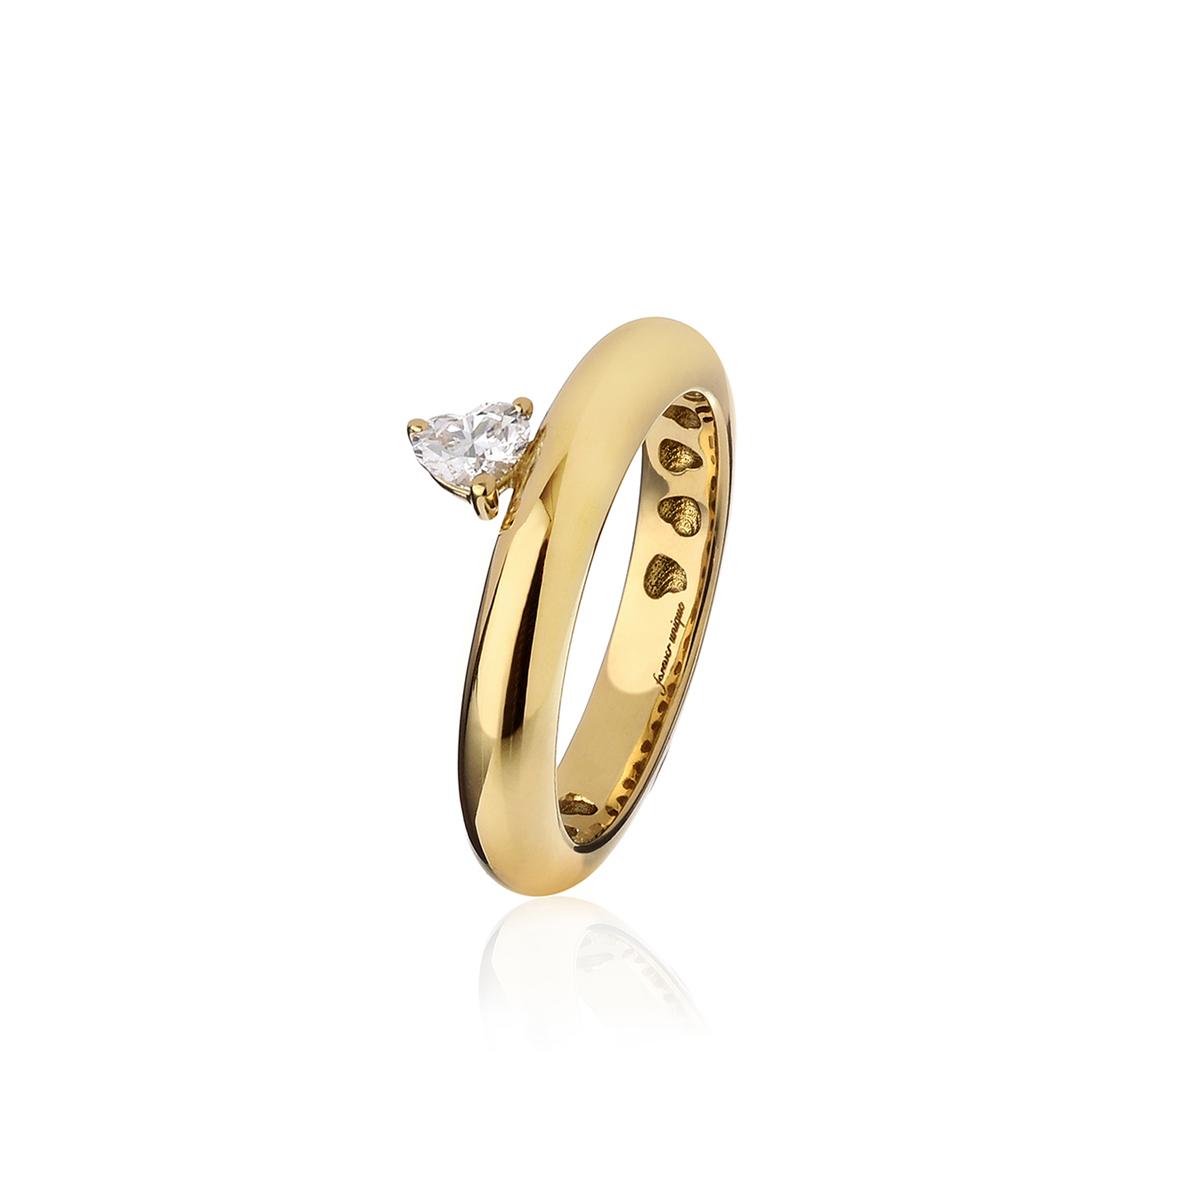 Chubby - Fancy Diamond Heart Ring (Thin Version)